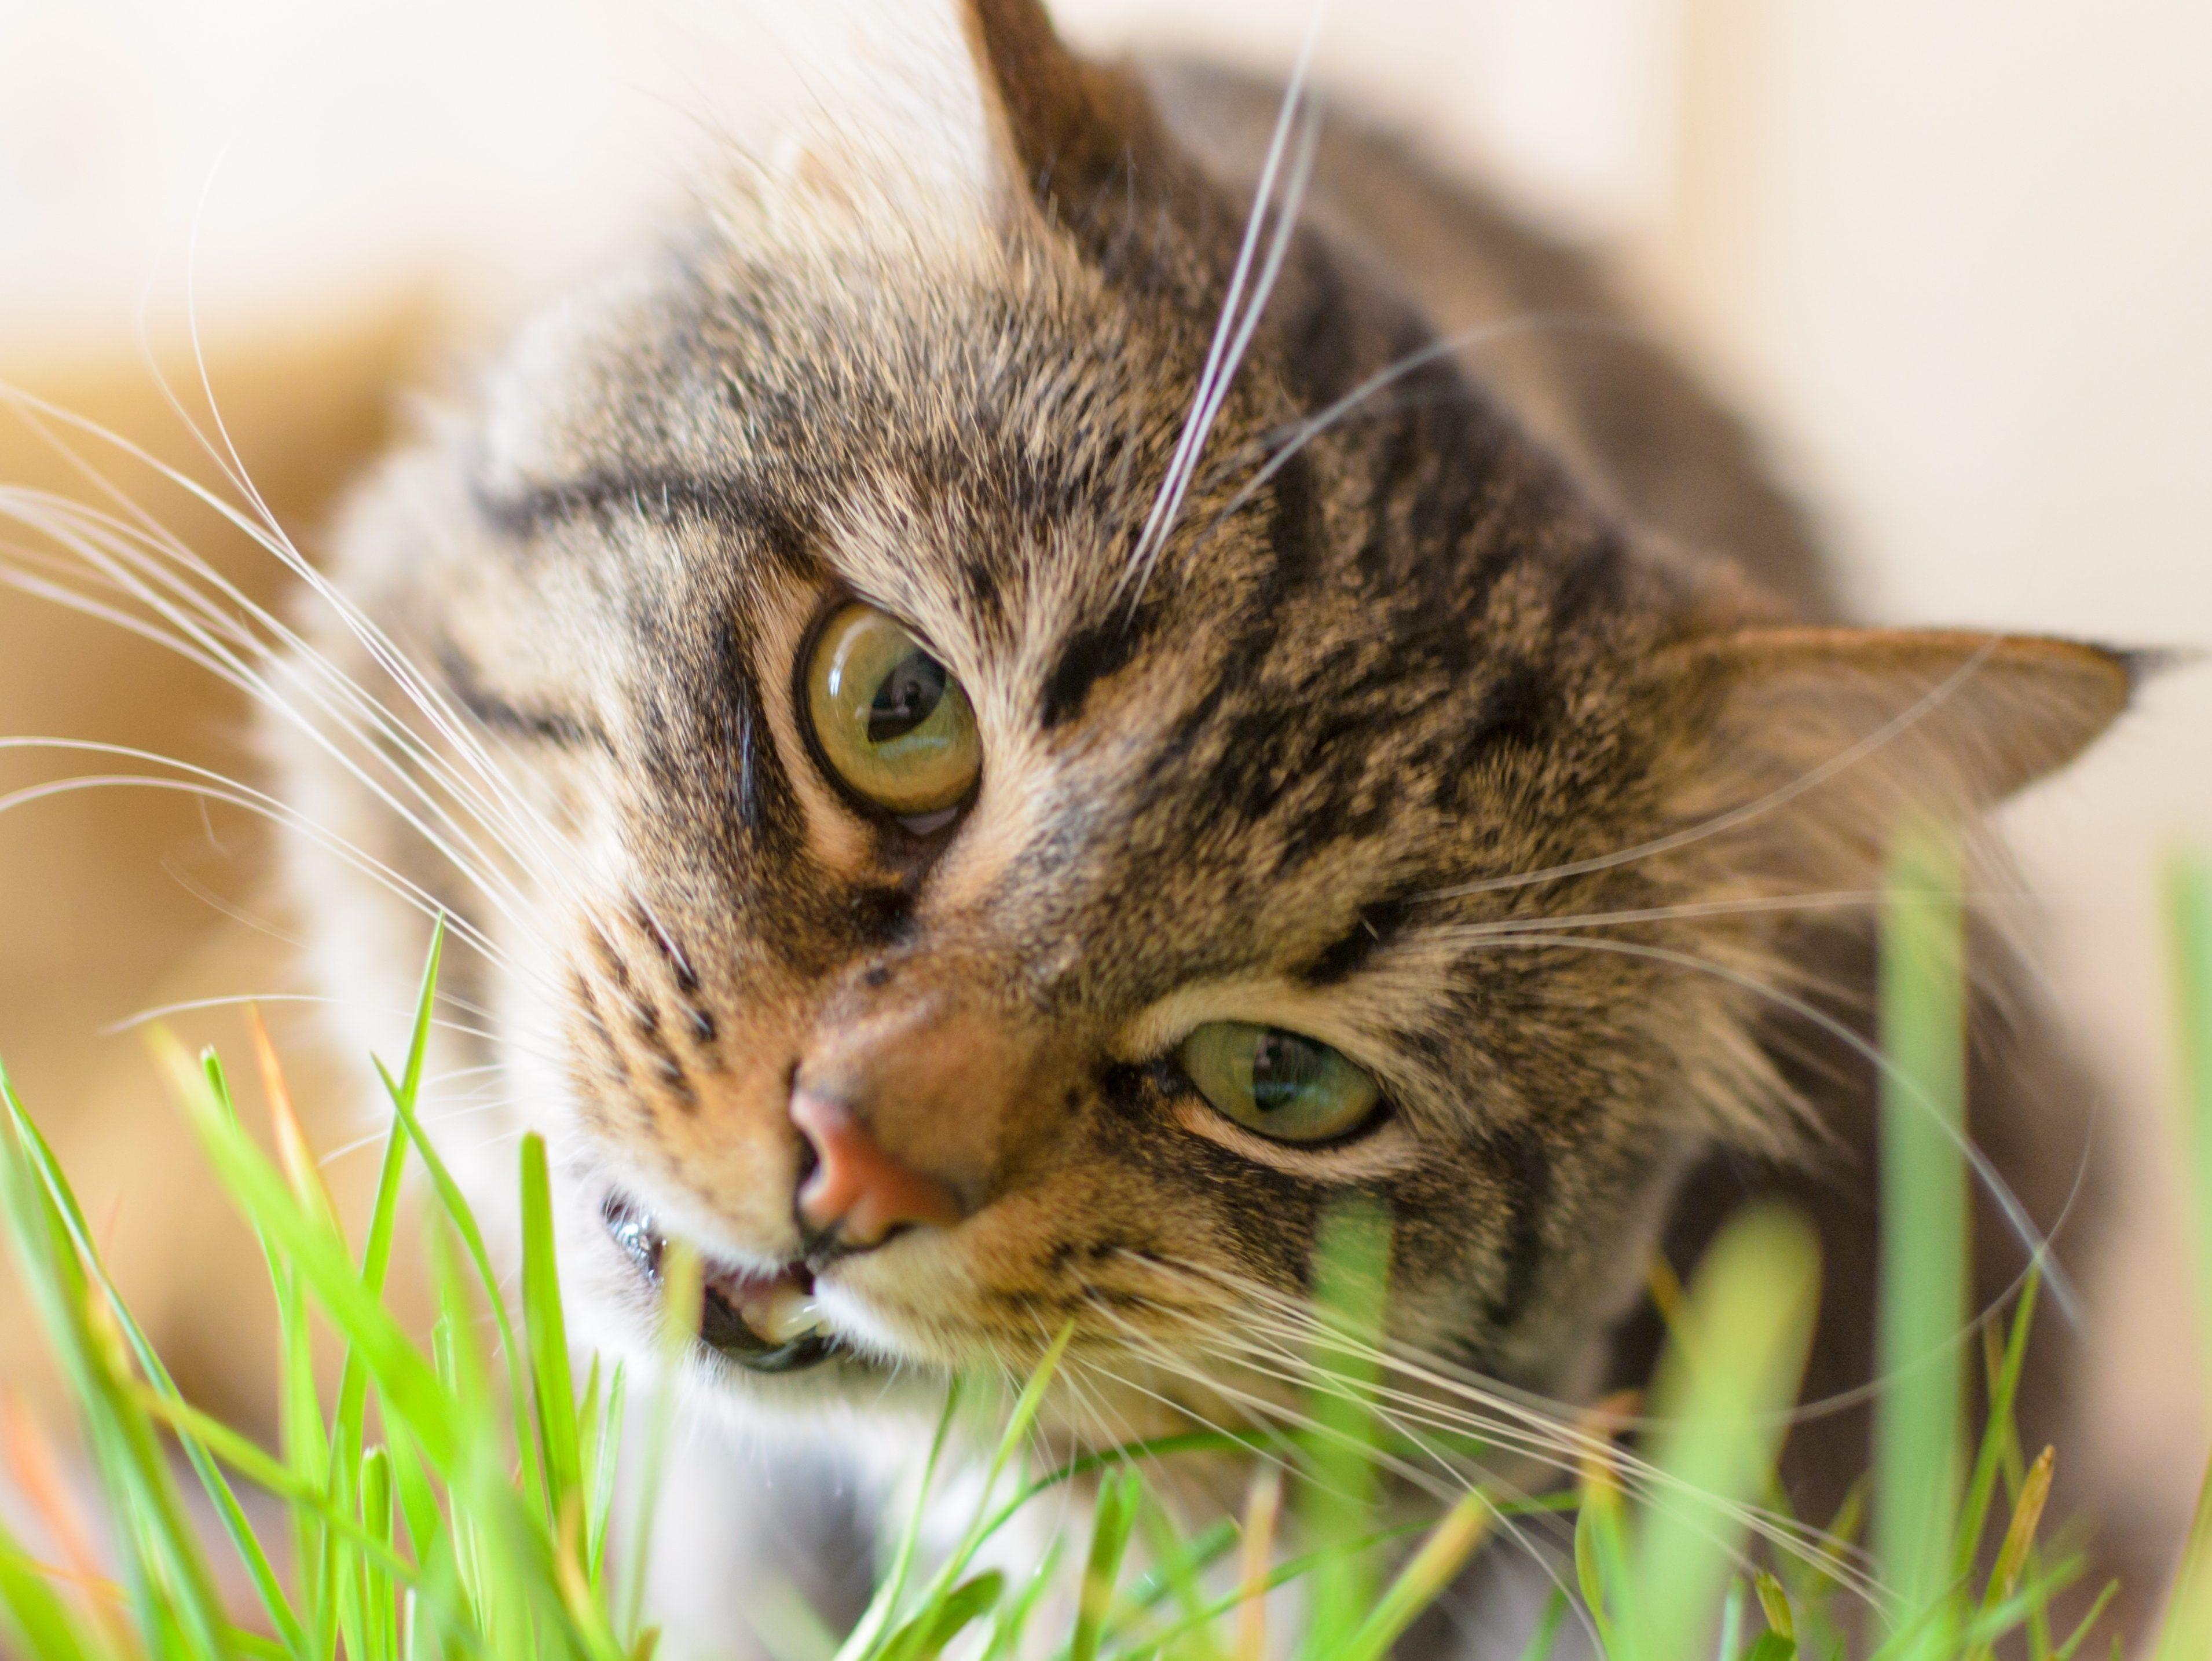 Beautiful,fluffy cat eating green grass.Horizontal .